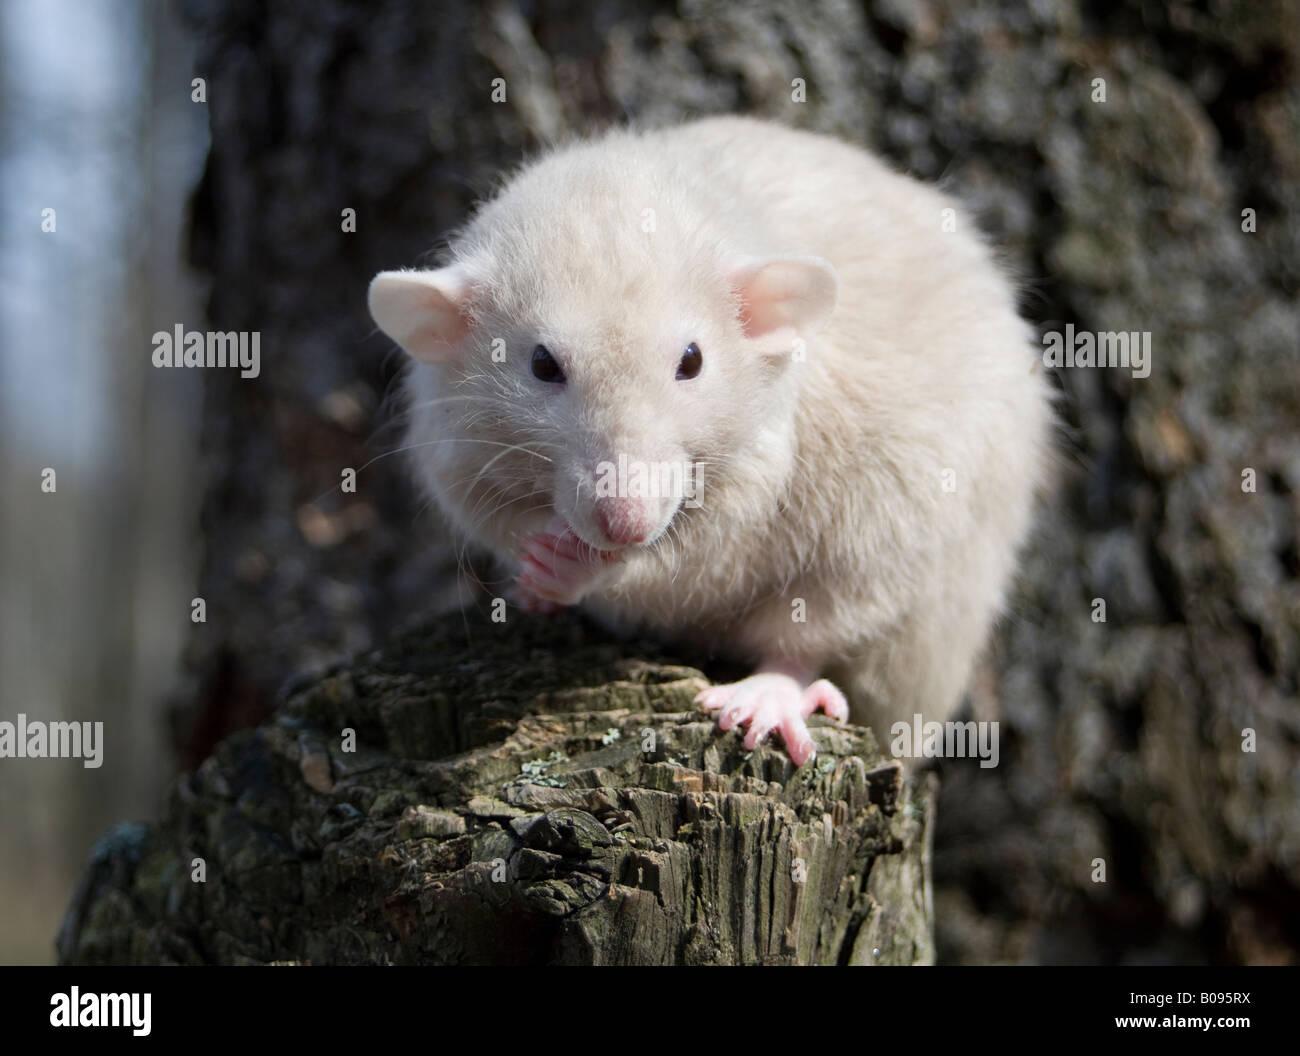 Dumbo Rat - Stock Image